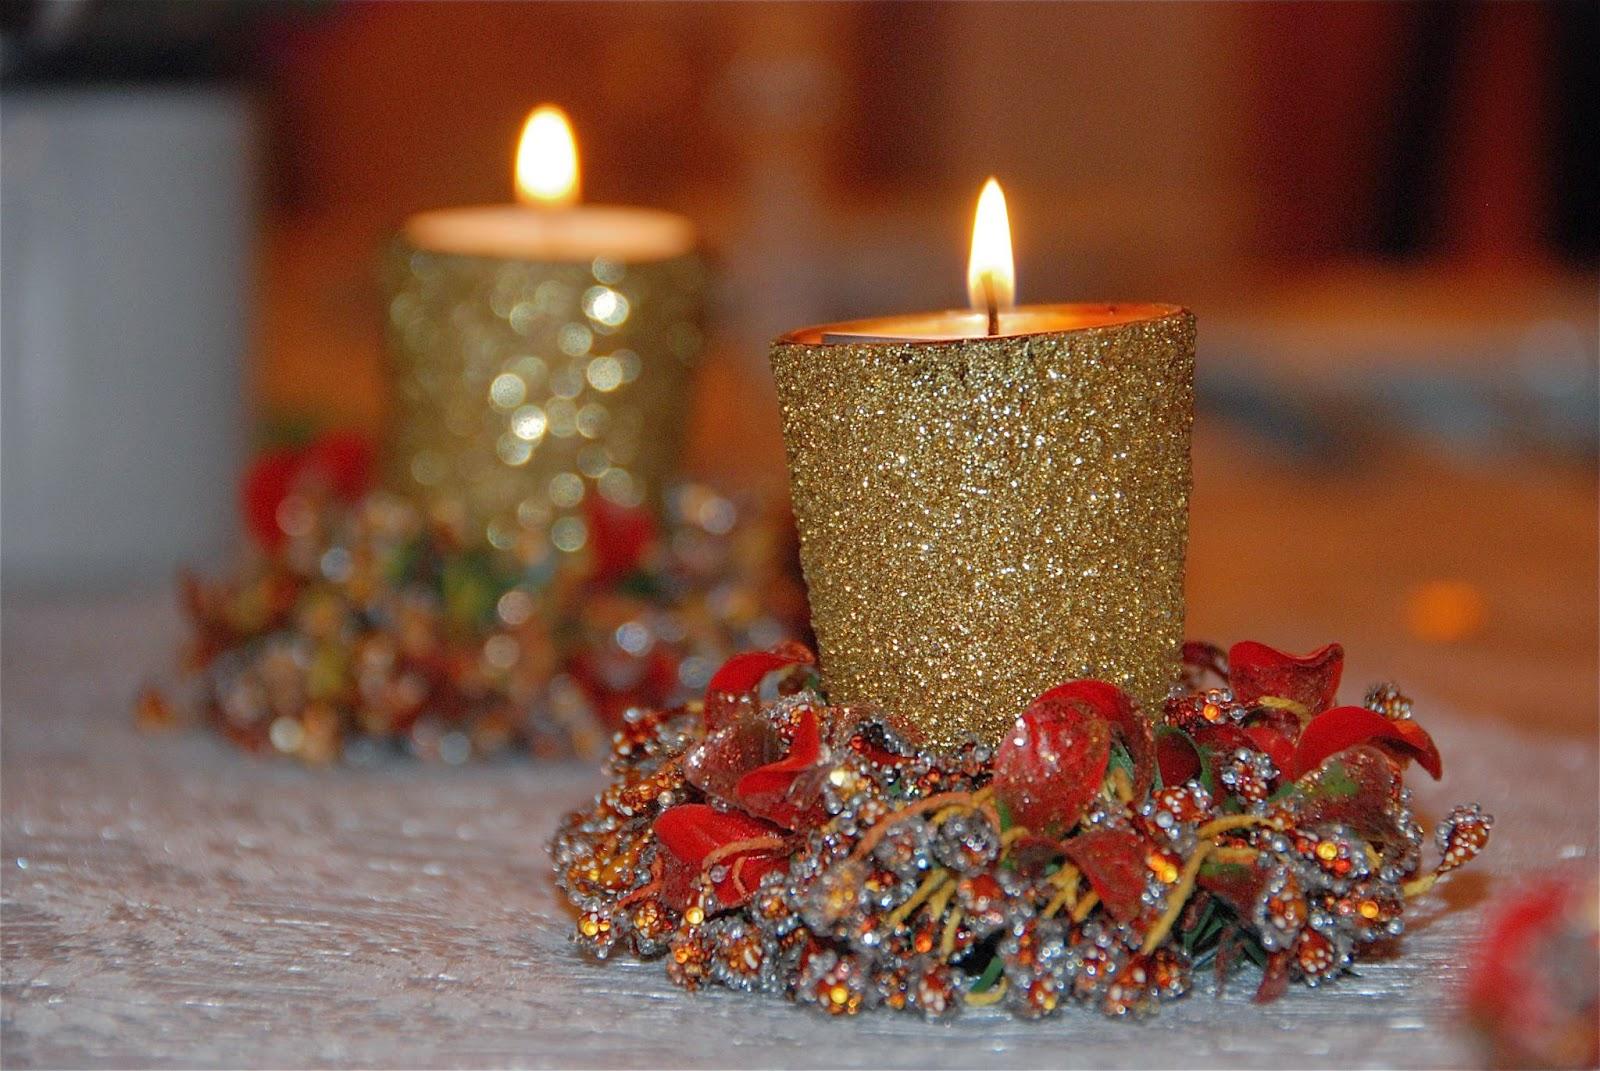 10 ideas para decorar velas navide as top 10 top ten - Velas decoradas para navidad ...